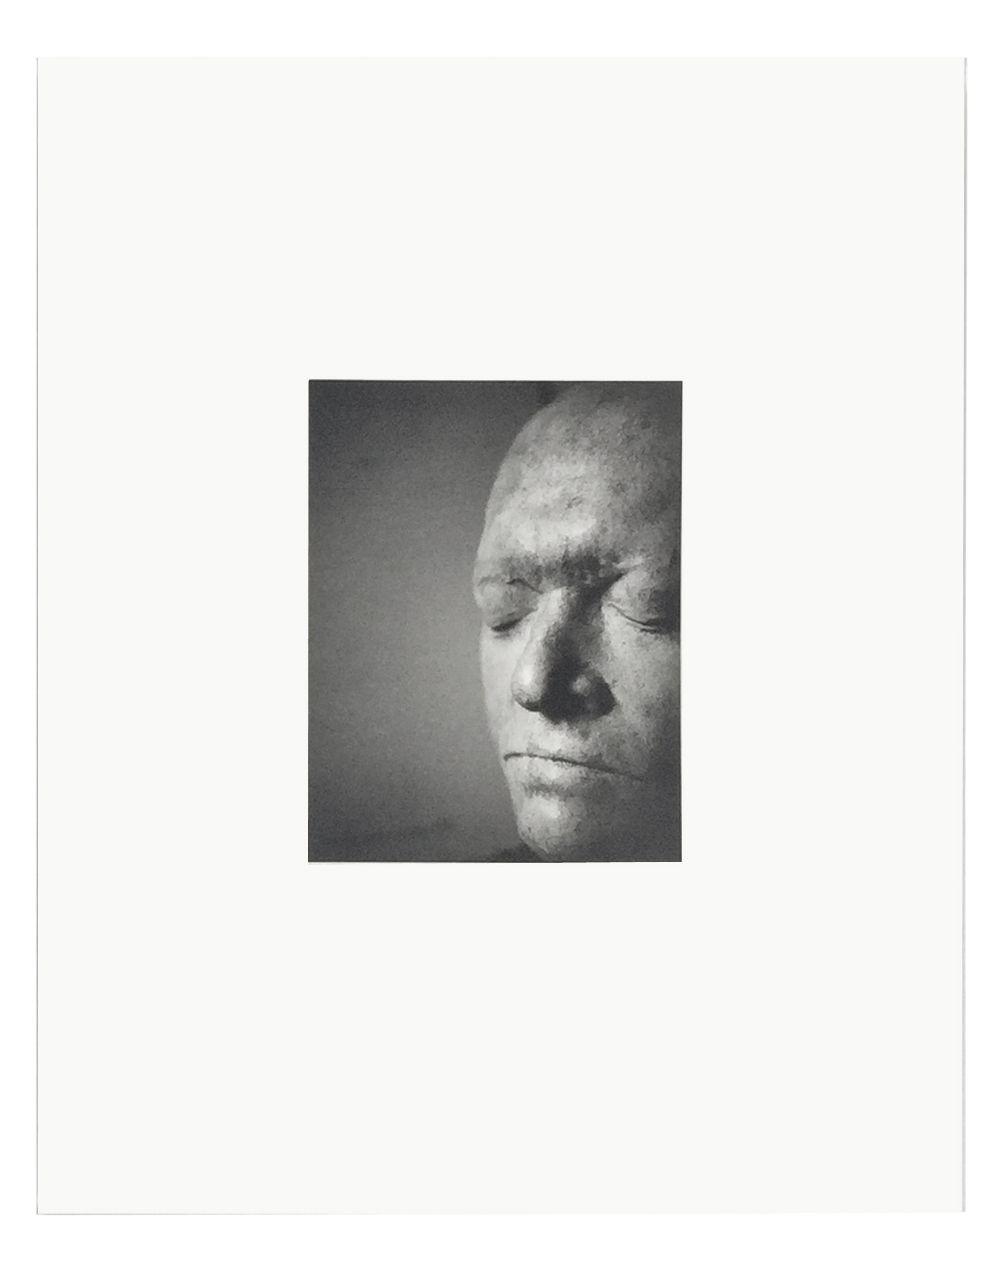 Blake Patti Smith | Photo book, Book art, Patti smith